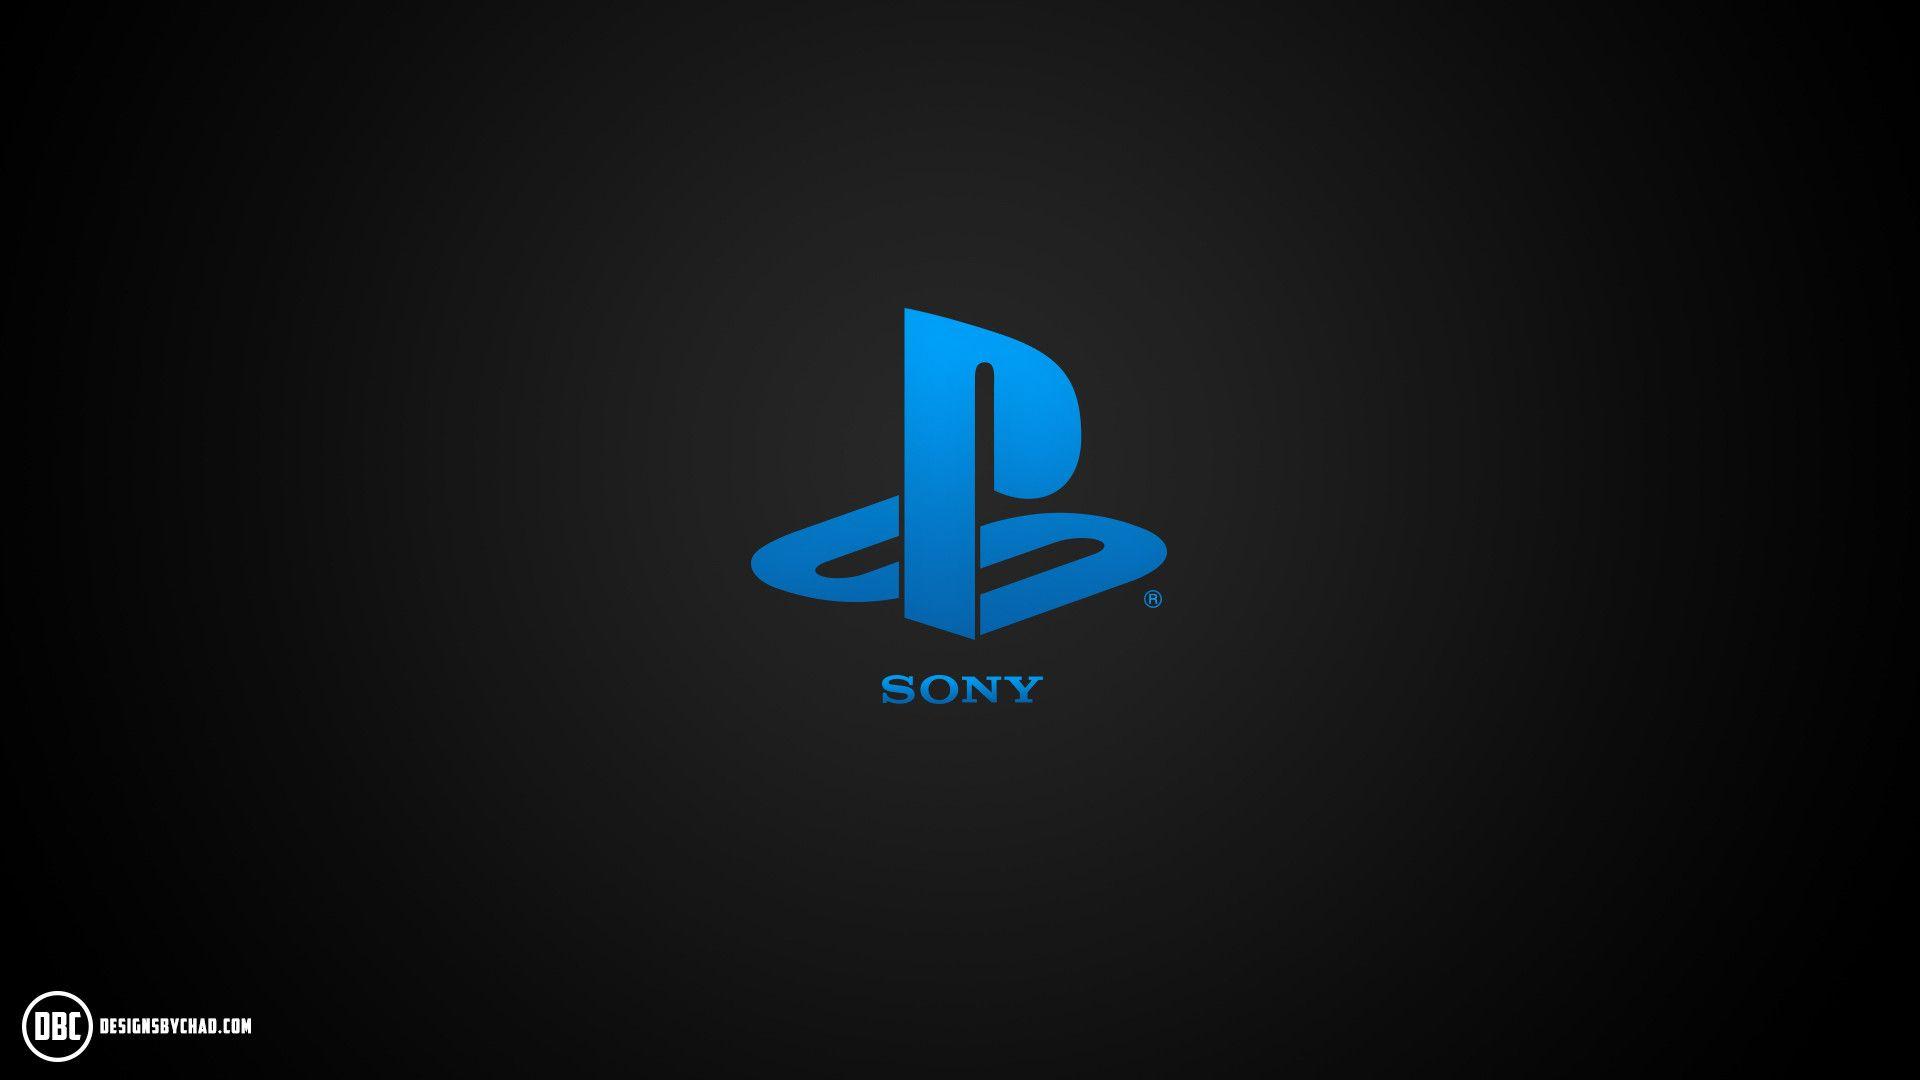 1920x1080 Playstation 4 Playstation Wallpaper Playstation Logo Ps4 Background Playstation